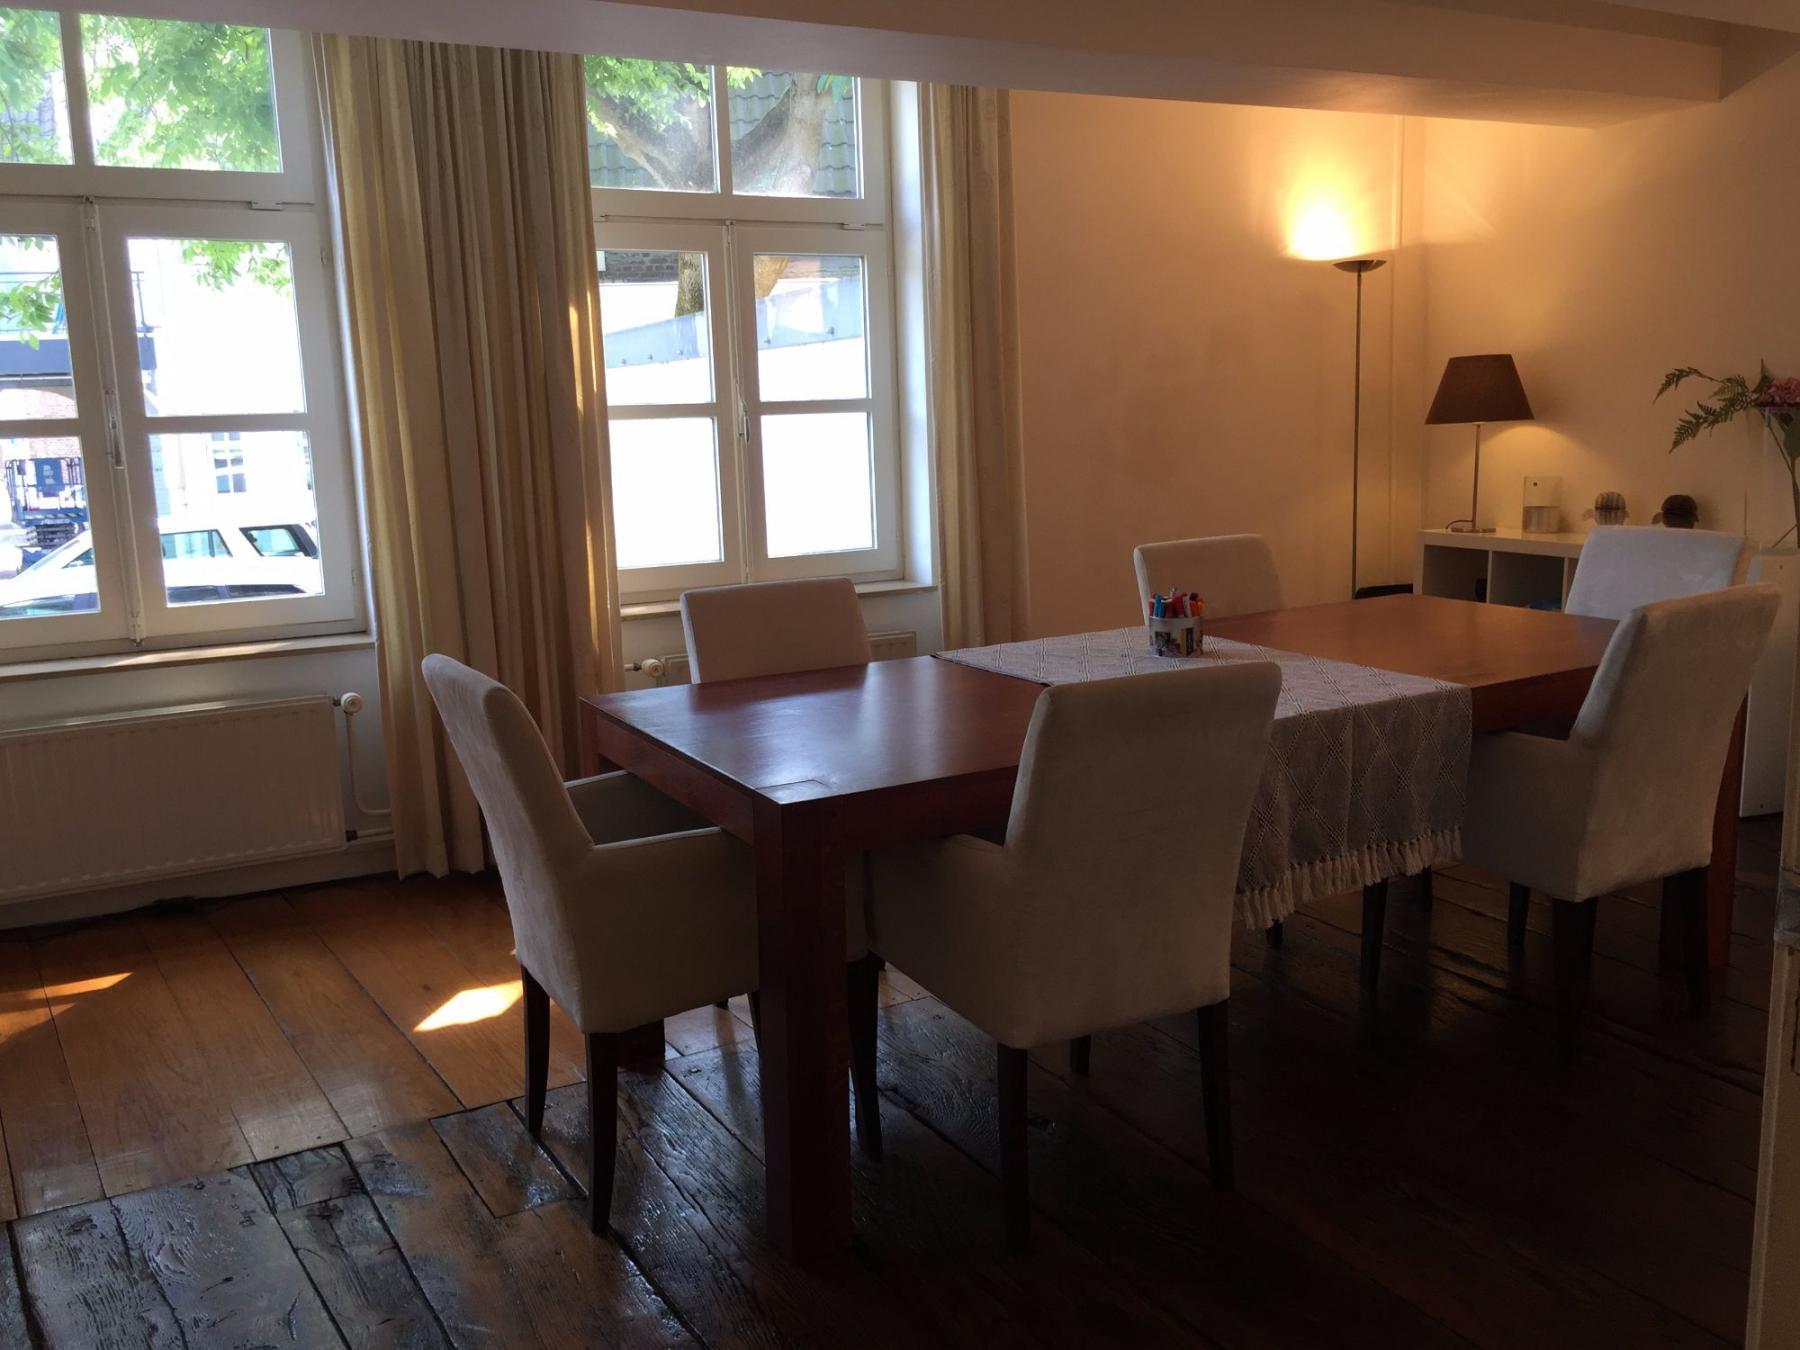 Meeting room in nice office building Maastricht